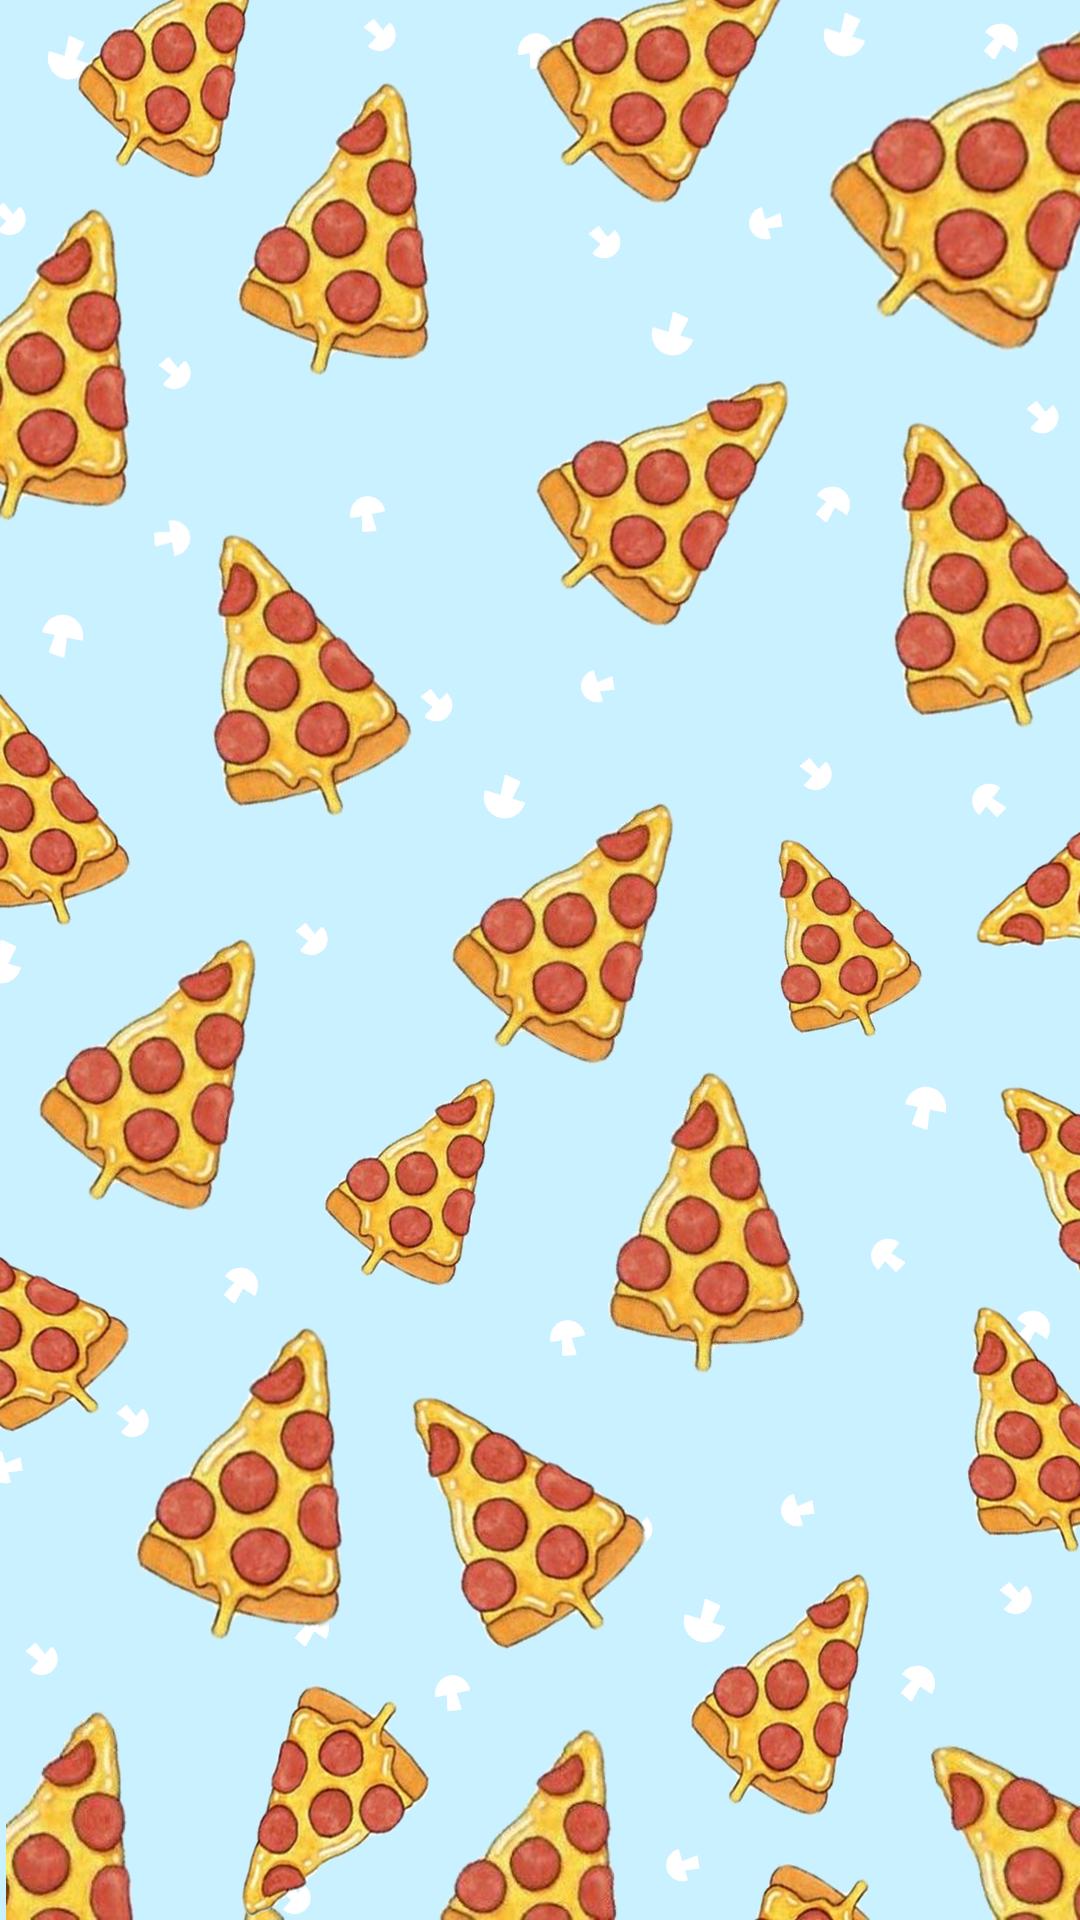 Wallpaper Love Pizza By Gocase Random Stuff In 2019 Sfondi